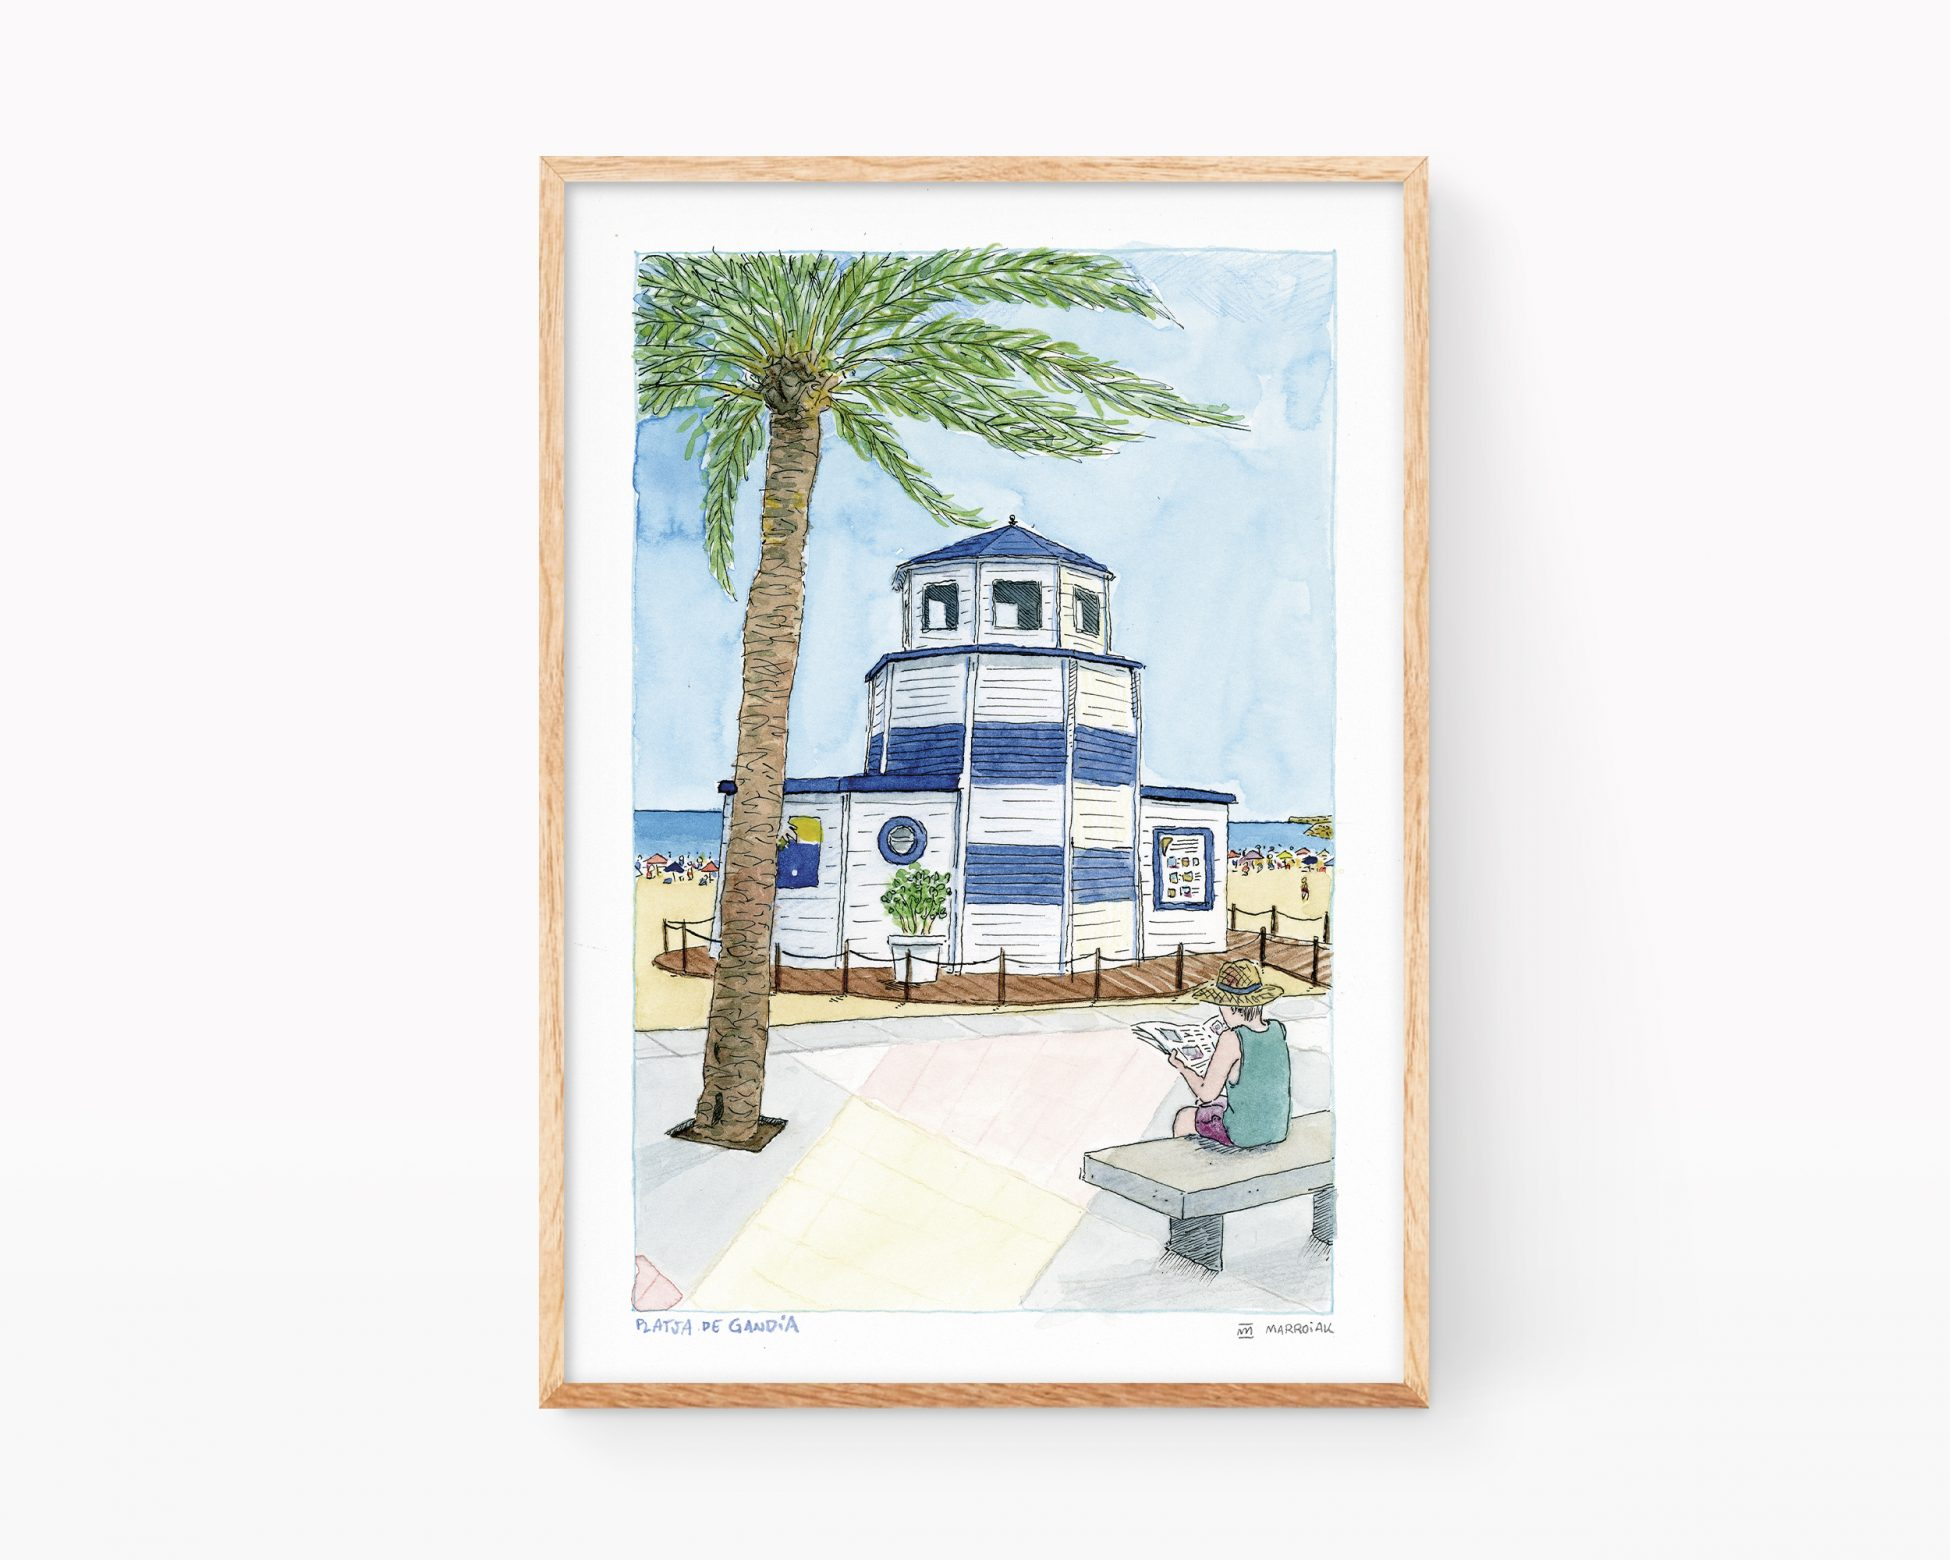 Gandia beach watercolor illustration decorative travel comic style print. Tourist Info Valencia, Spain.